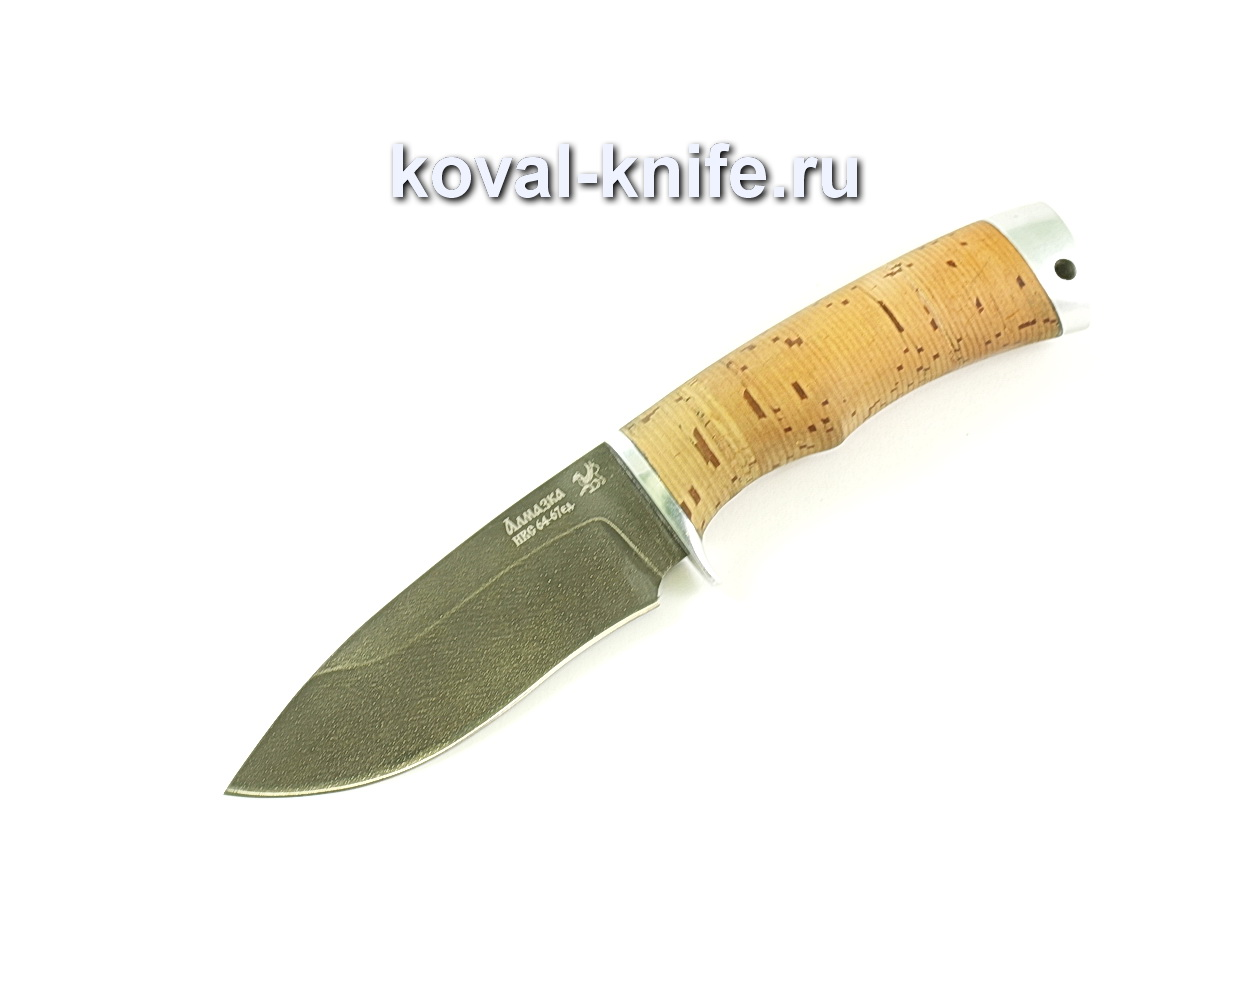 Нож Сапсан-2 (сталь ХВ5-Алмазка), рукоять береста A044